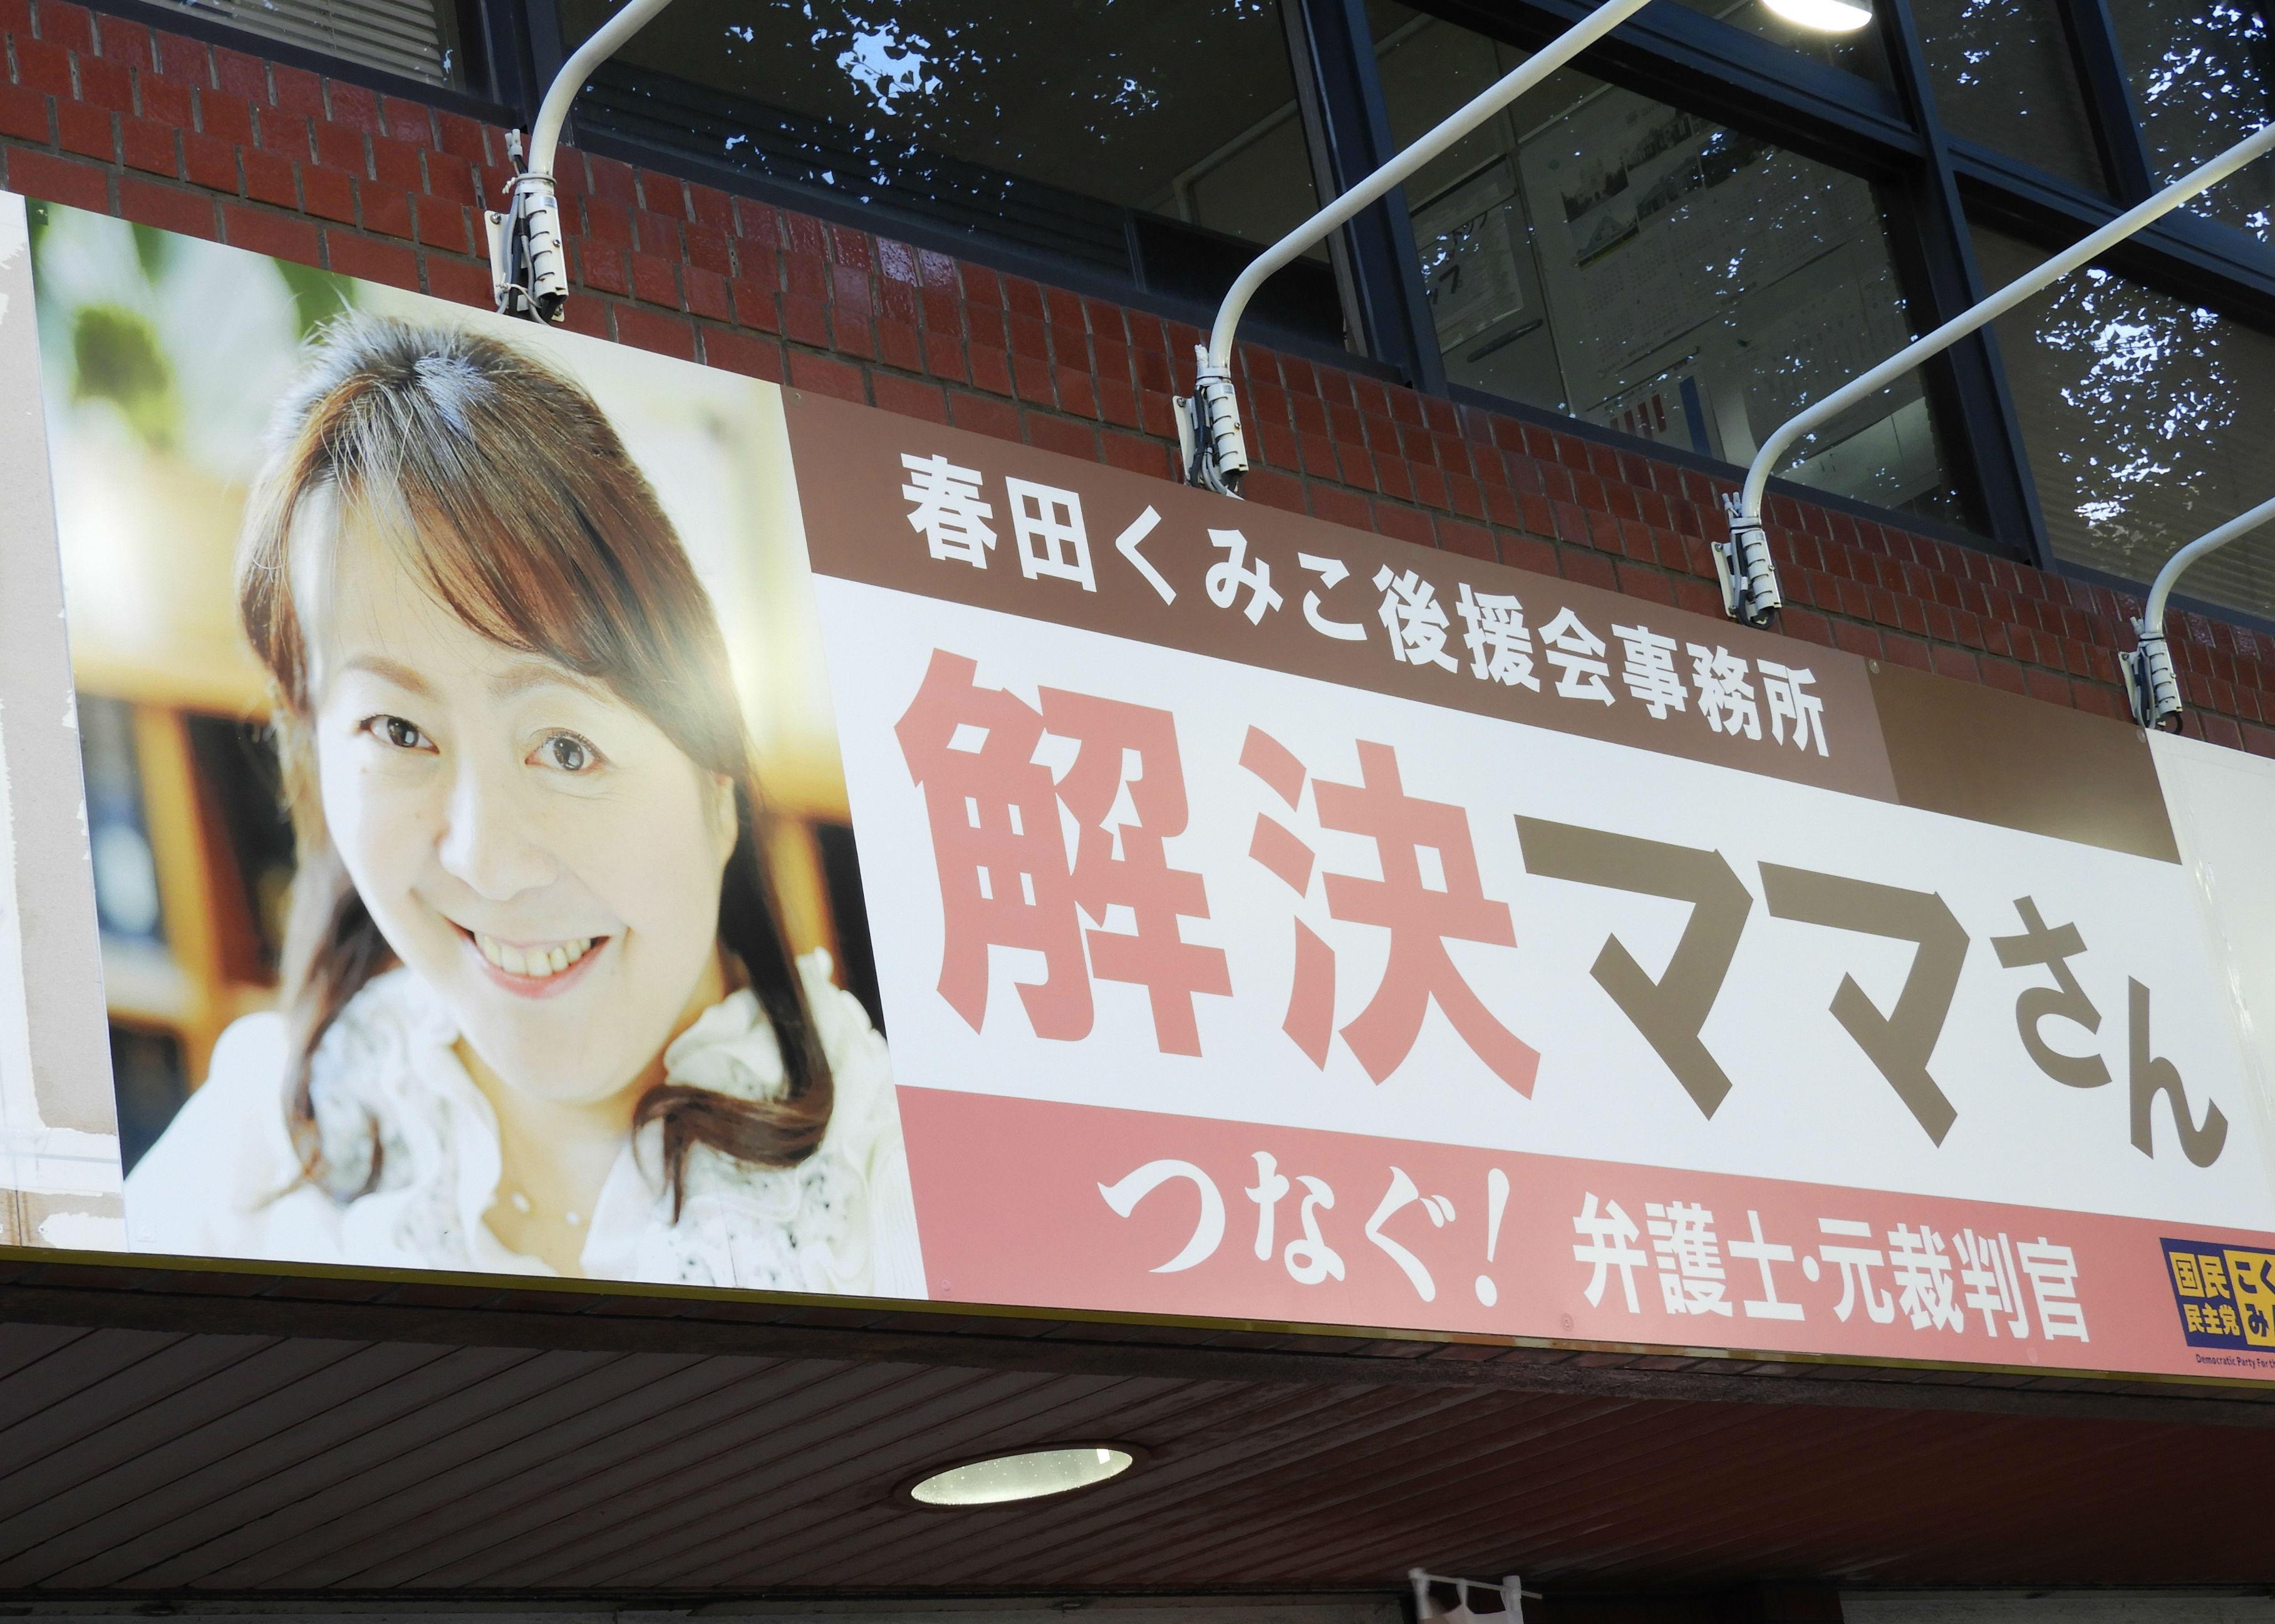 http://hunter-investigate.jp/news/f1da2394e33d5445382d2e25d66322fe487789e7.jpg